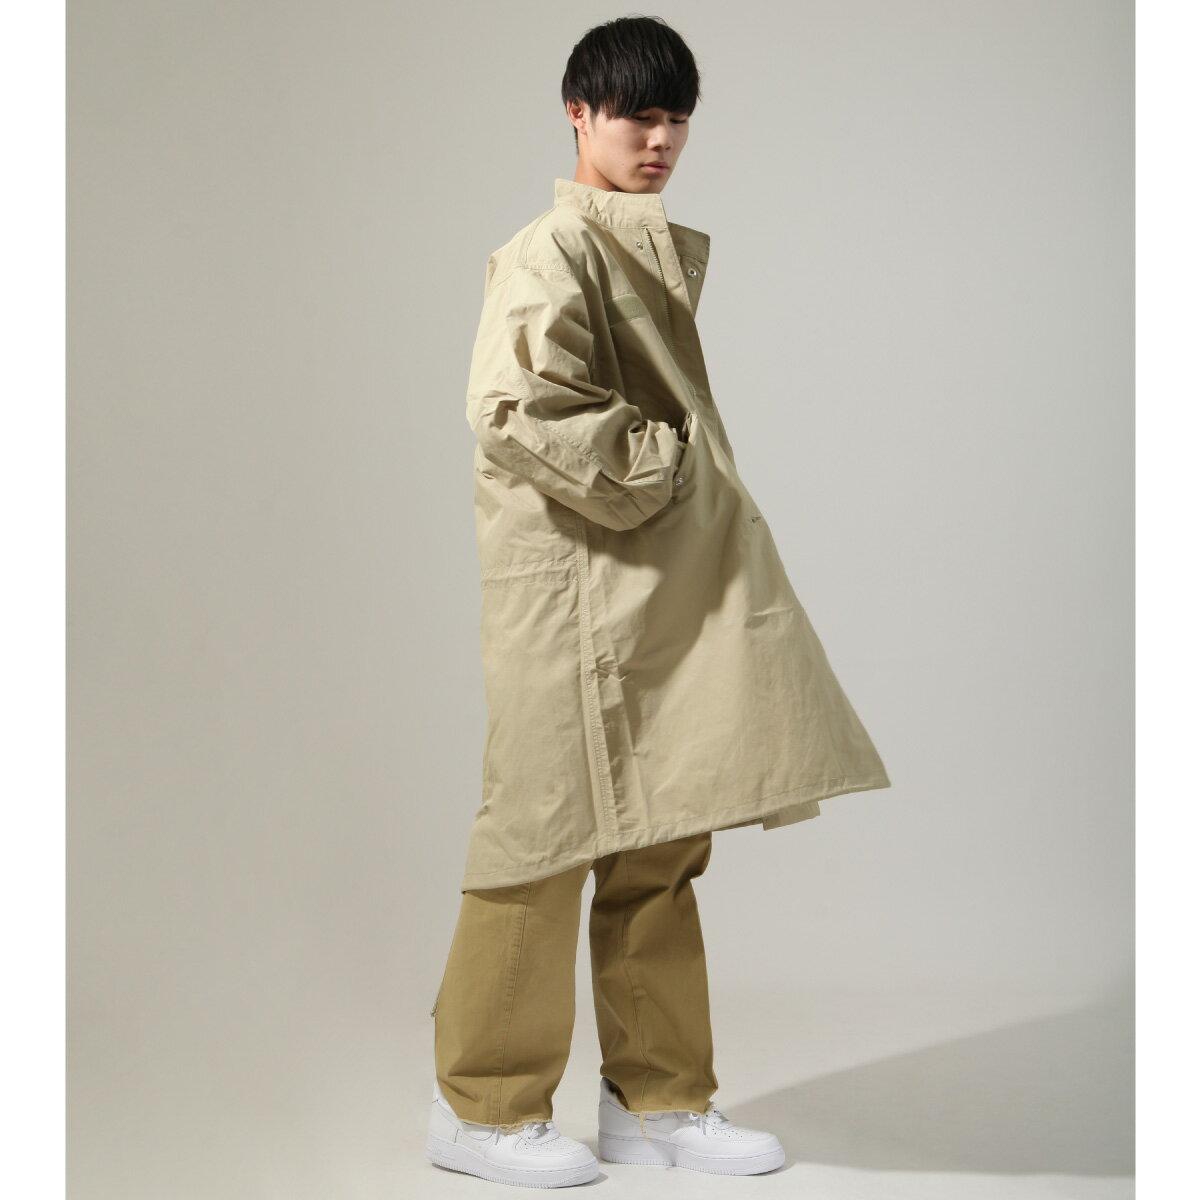 【New】ZIP 摩斯MODS大衣 長板 2